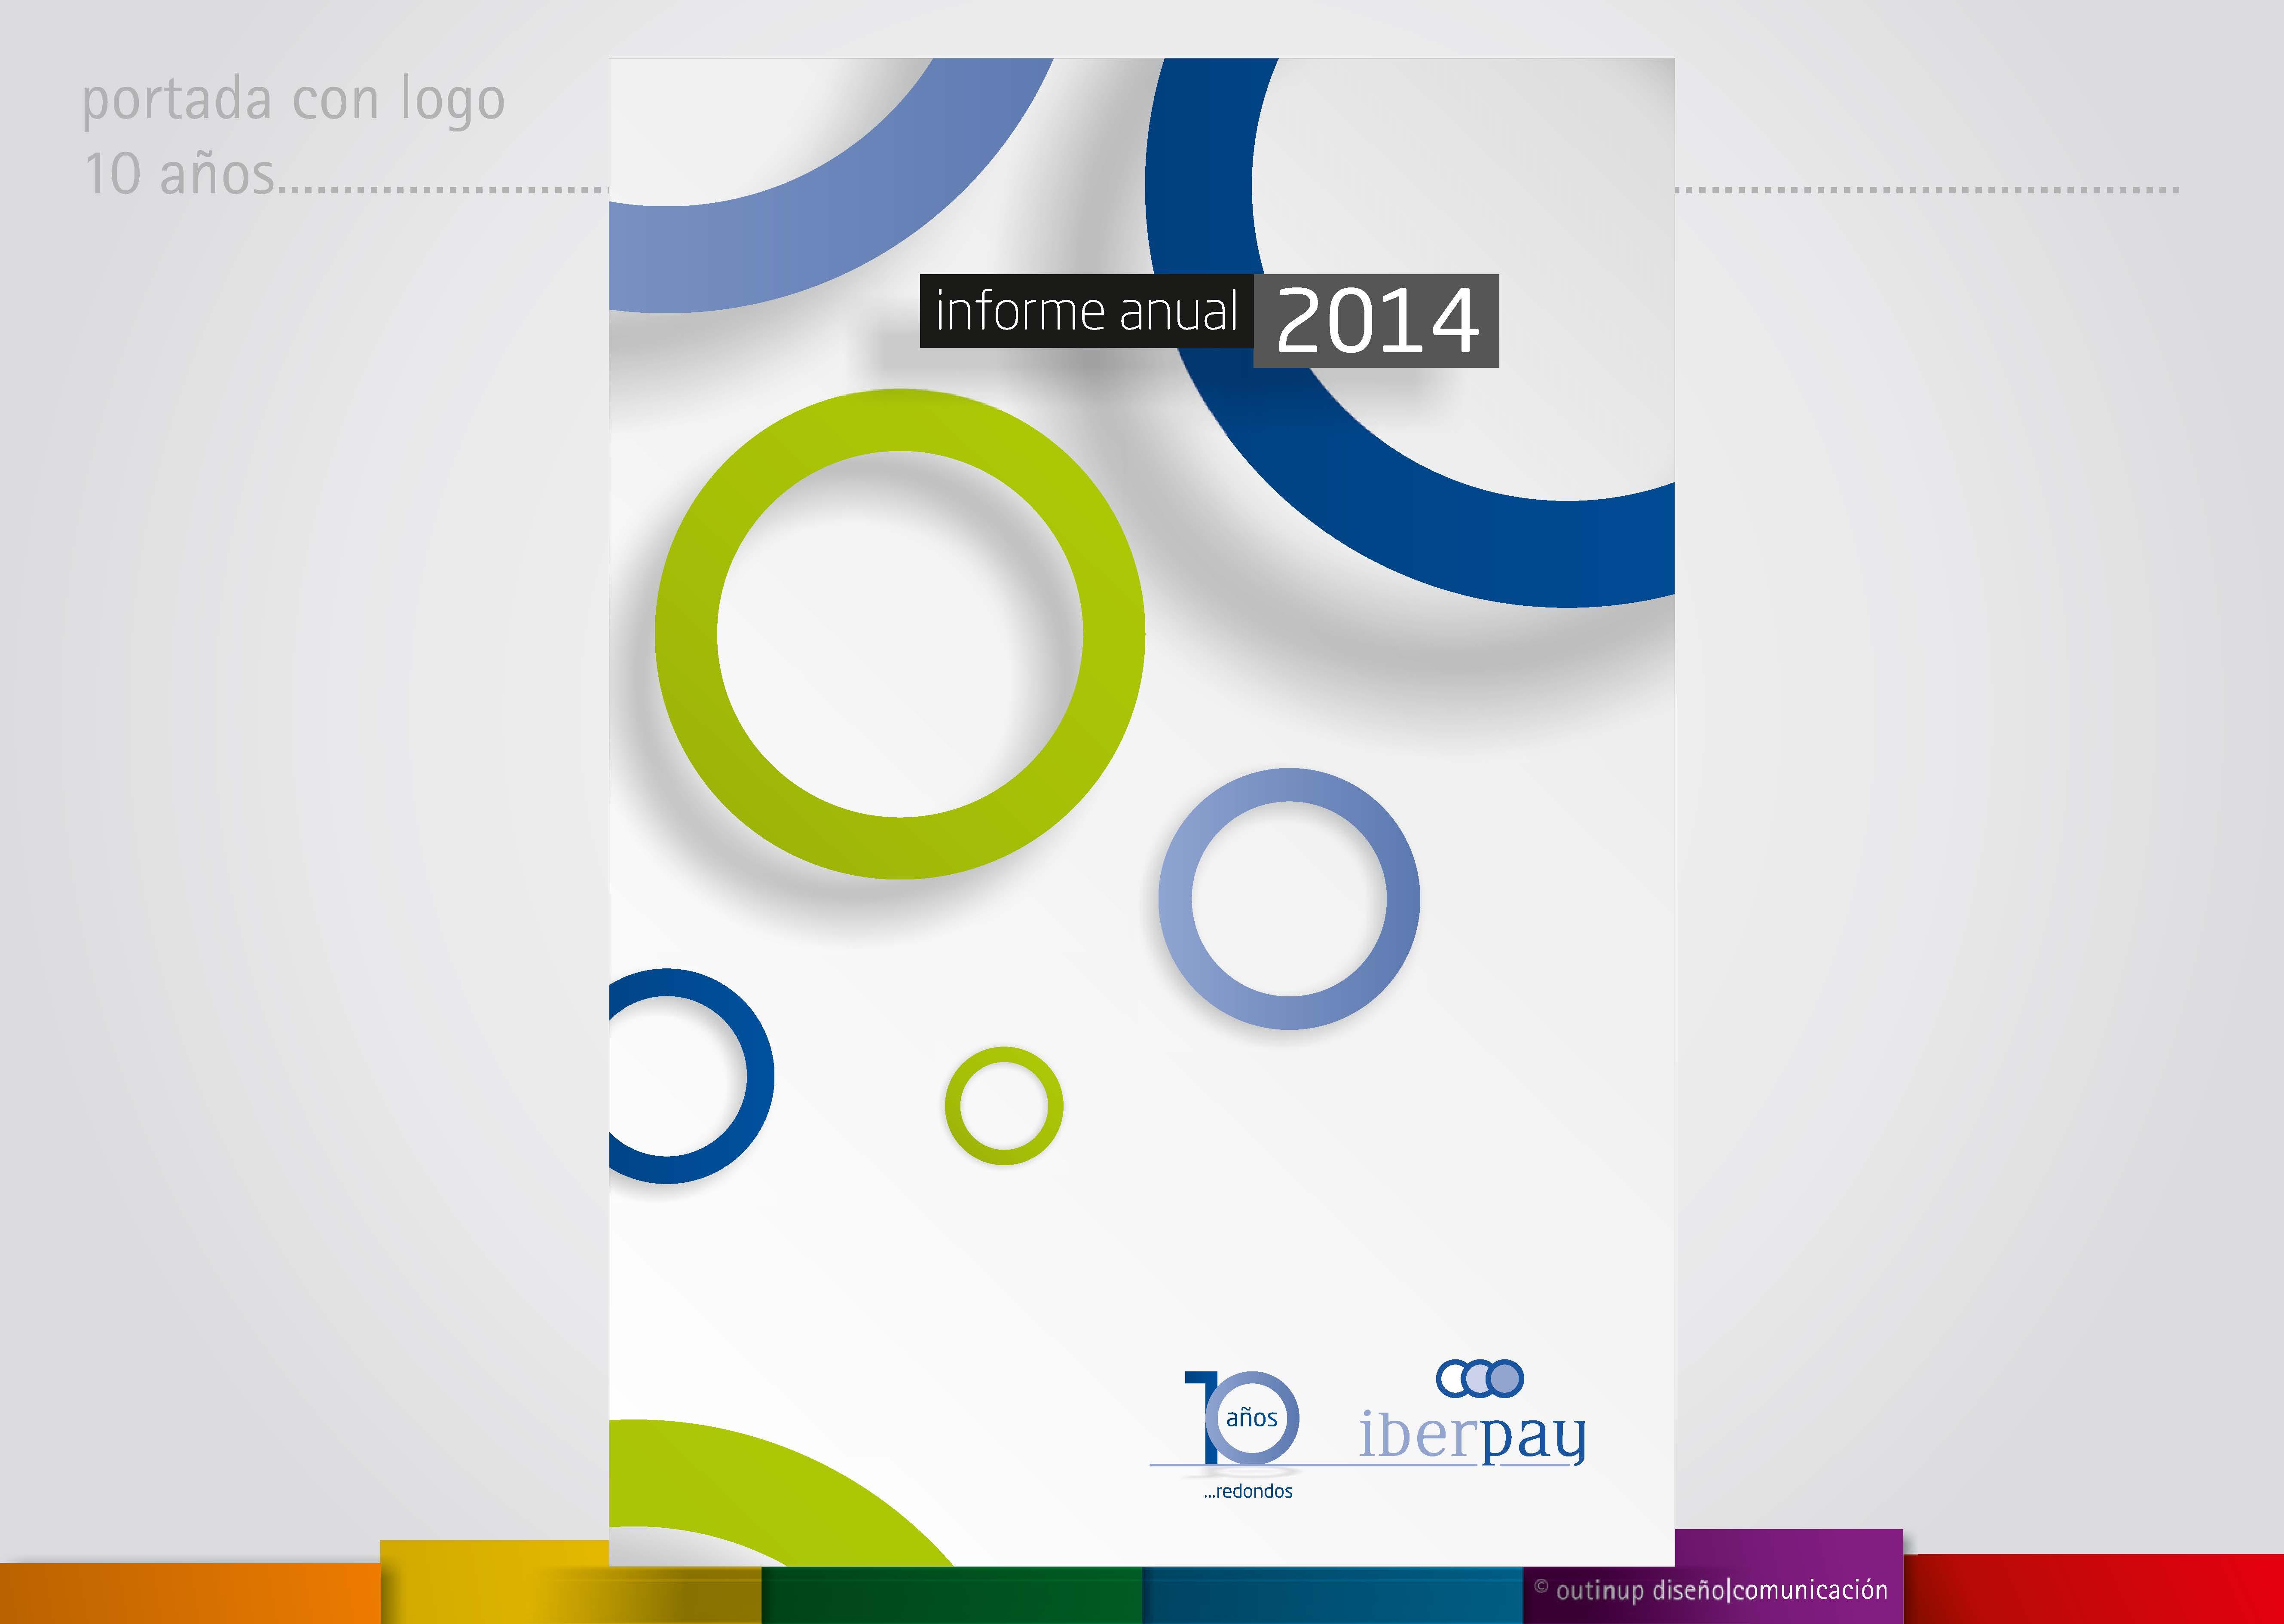 IC_Logo_IBERPAY_LOGO_10_AÑOS_(2).jpg